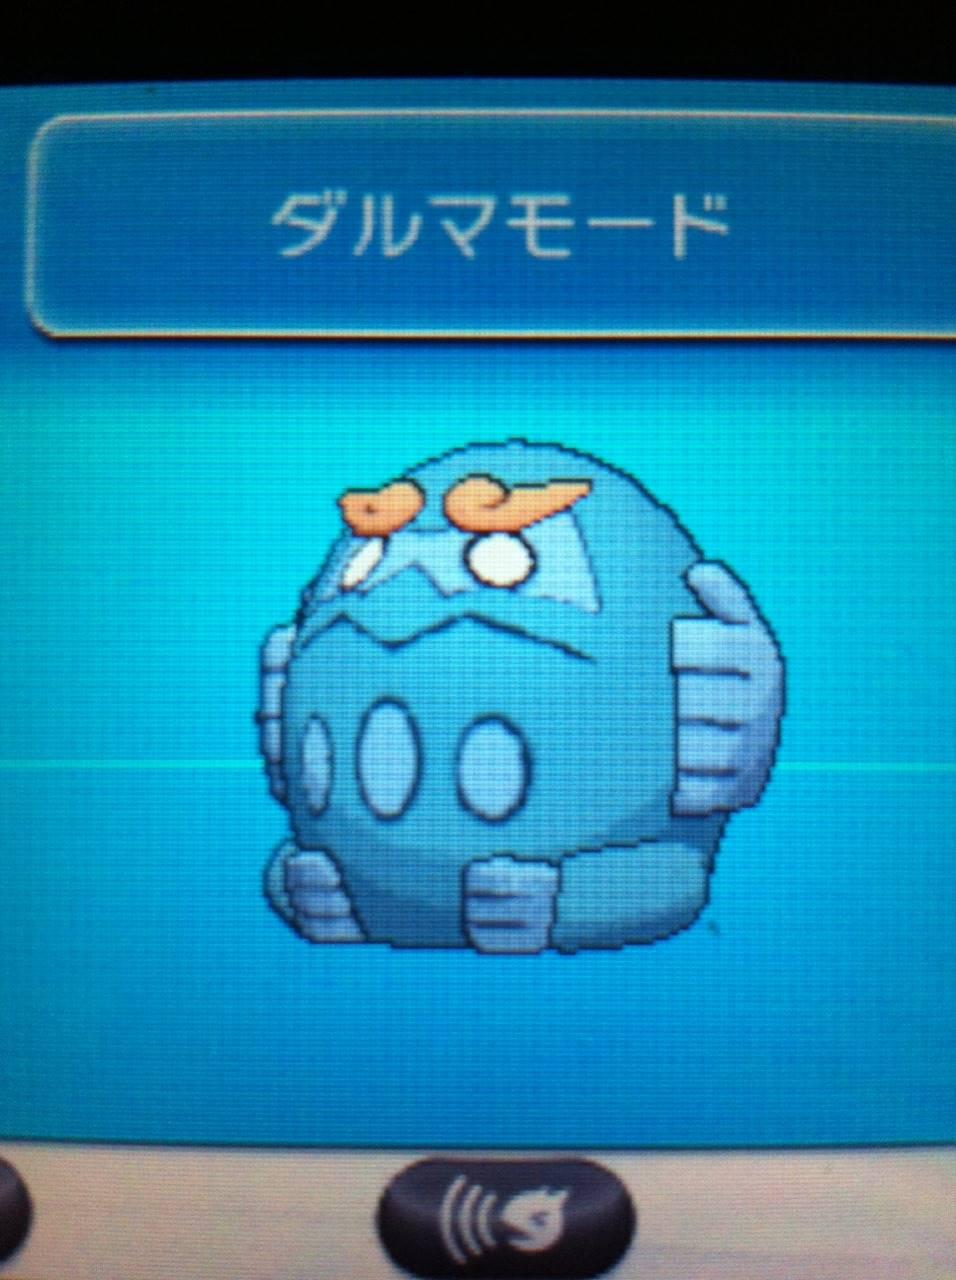 chihida7afe.jpg